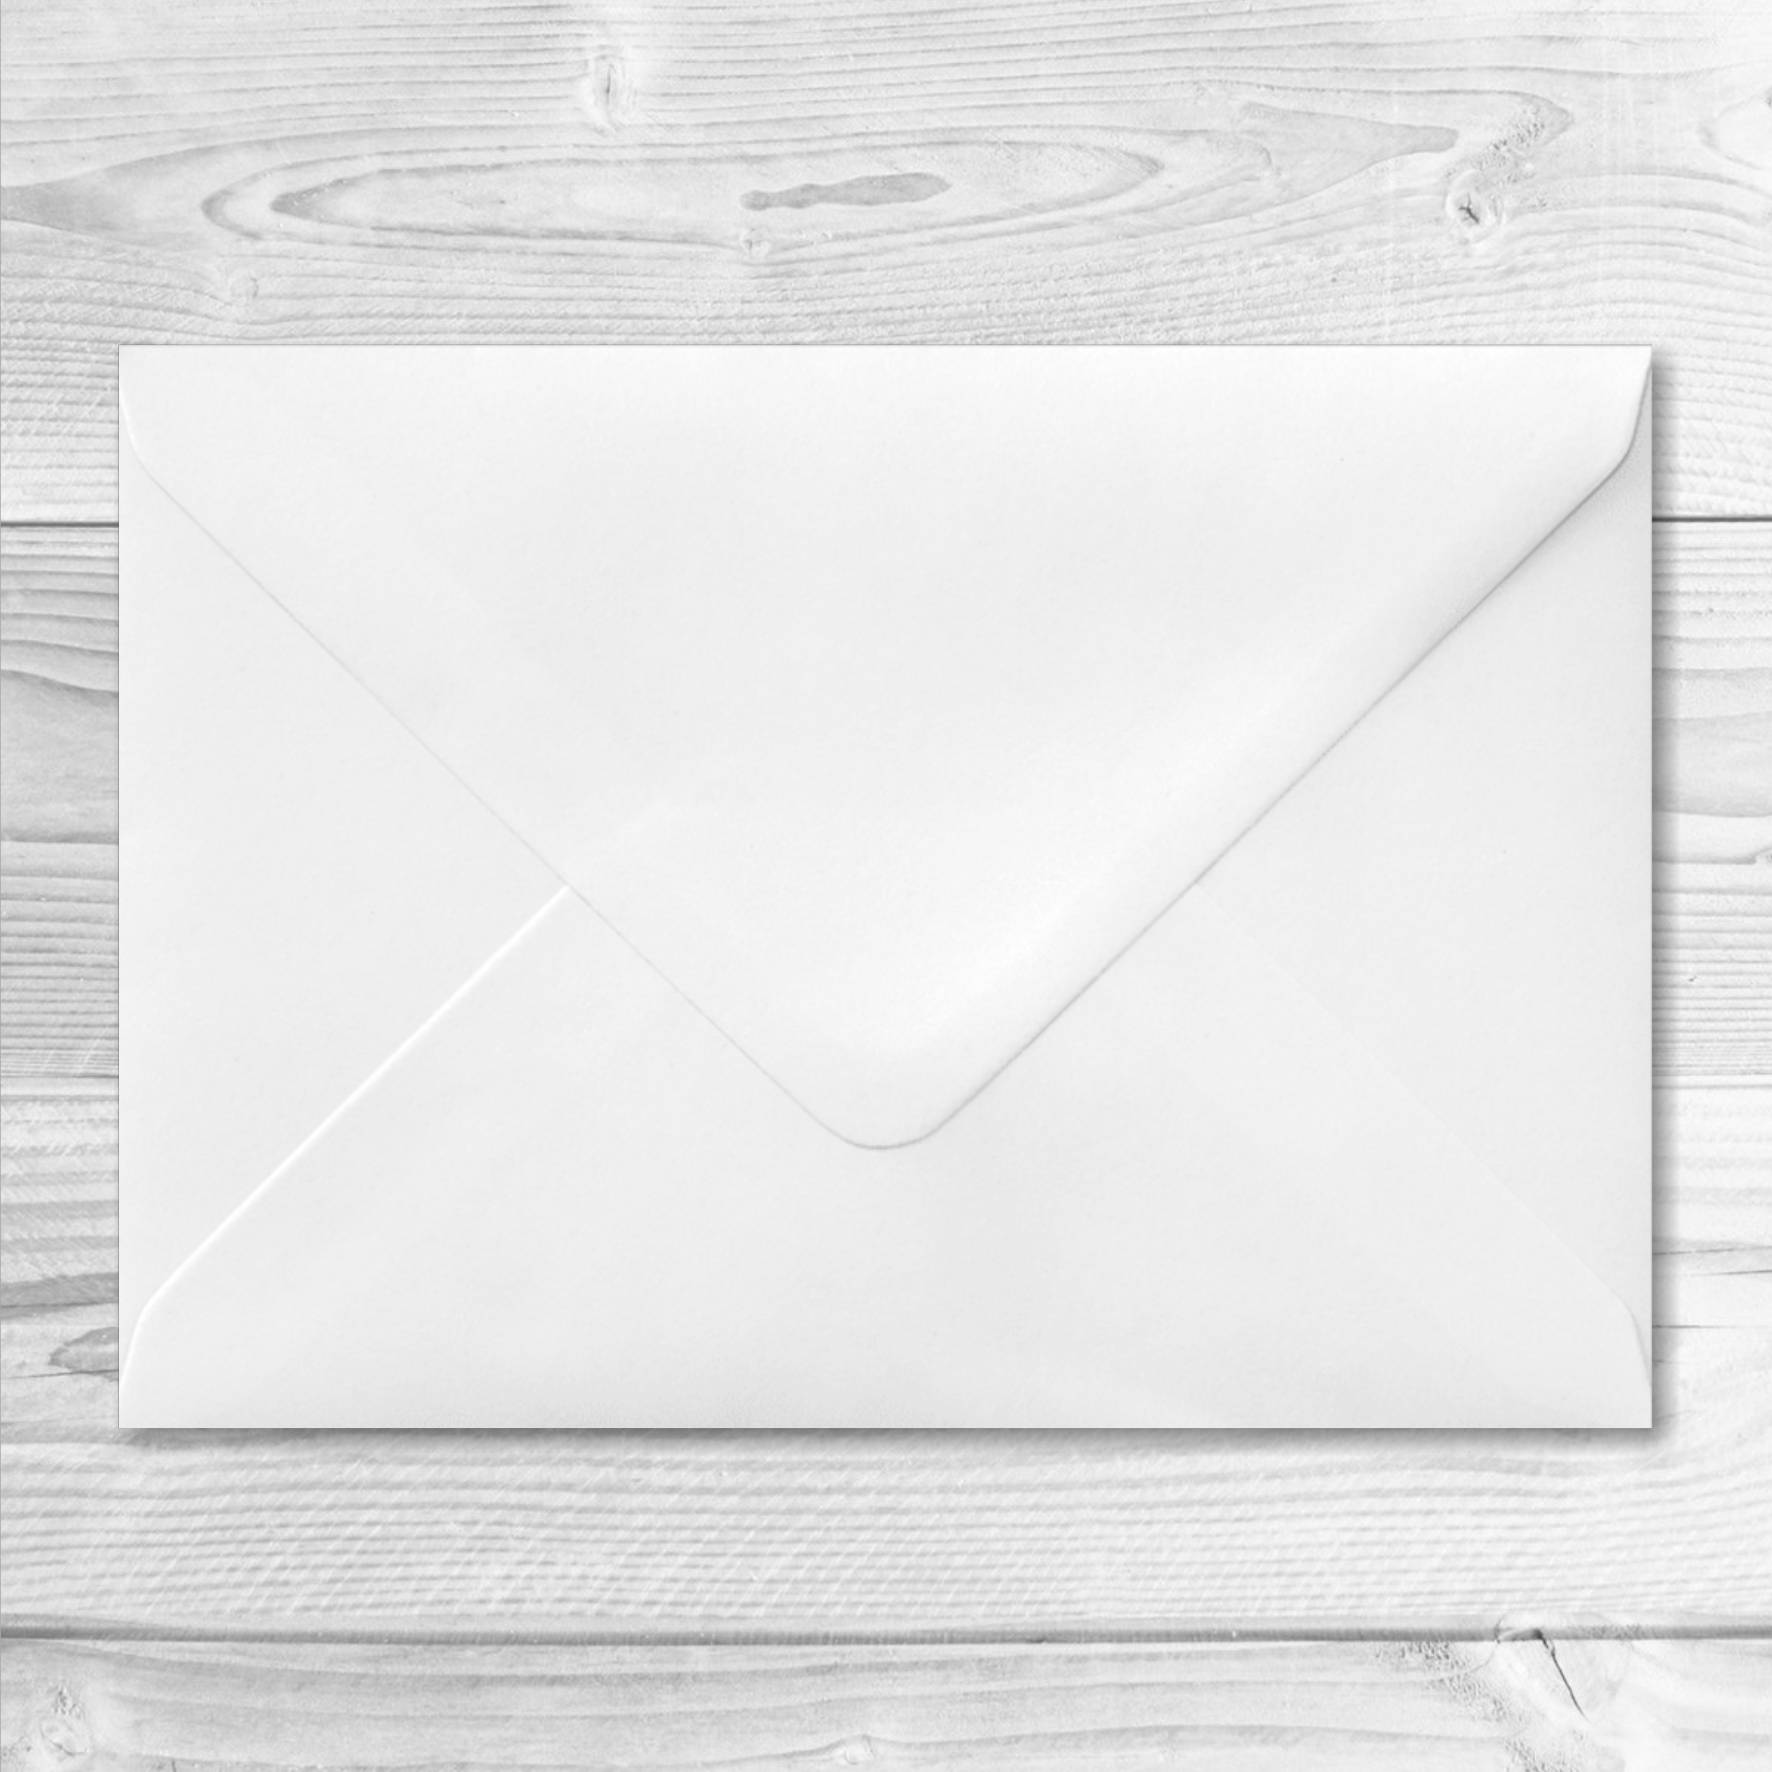 enveloppe blanche 13 x 19 cm pas cher